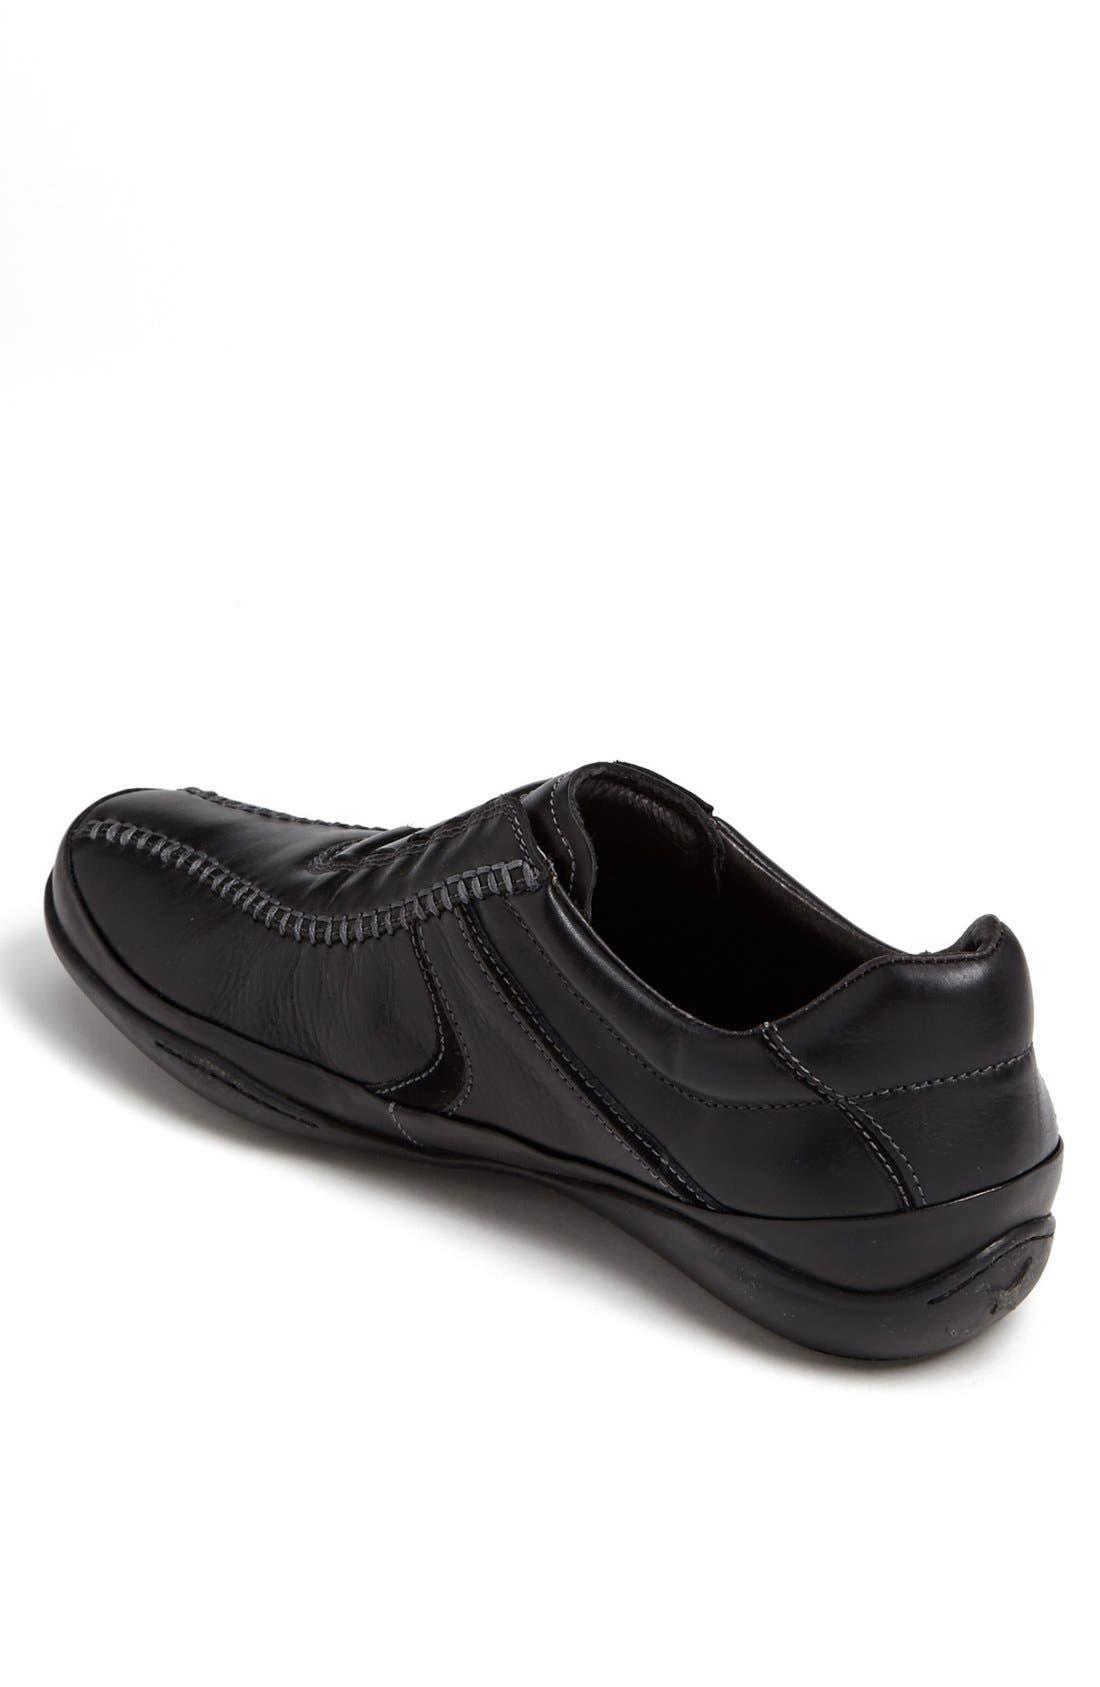 Alternate Image 2  - PIKOLINOS 'Suecia' Sneaker